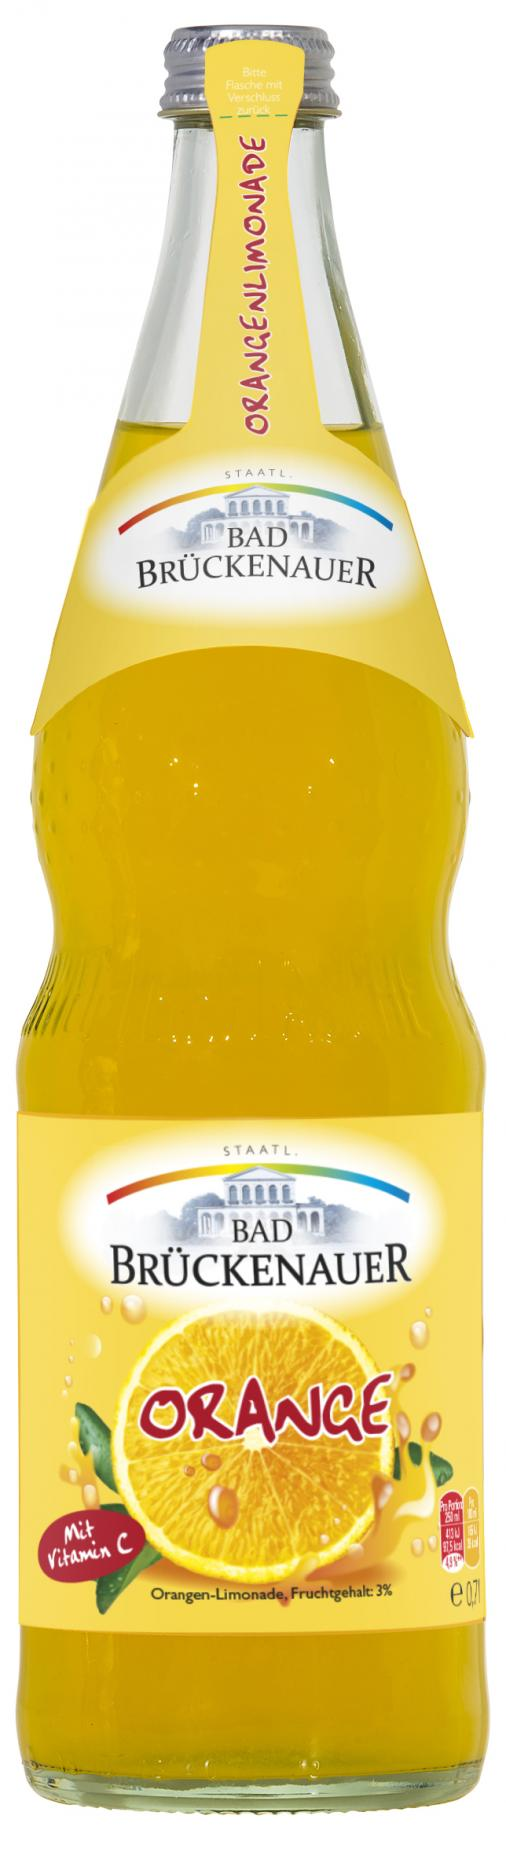 Staatl. Bad Brückenauer Orangenlimonade 12 x 0,7 l Glas